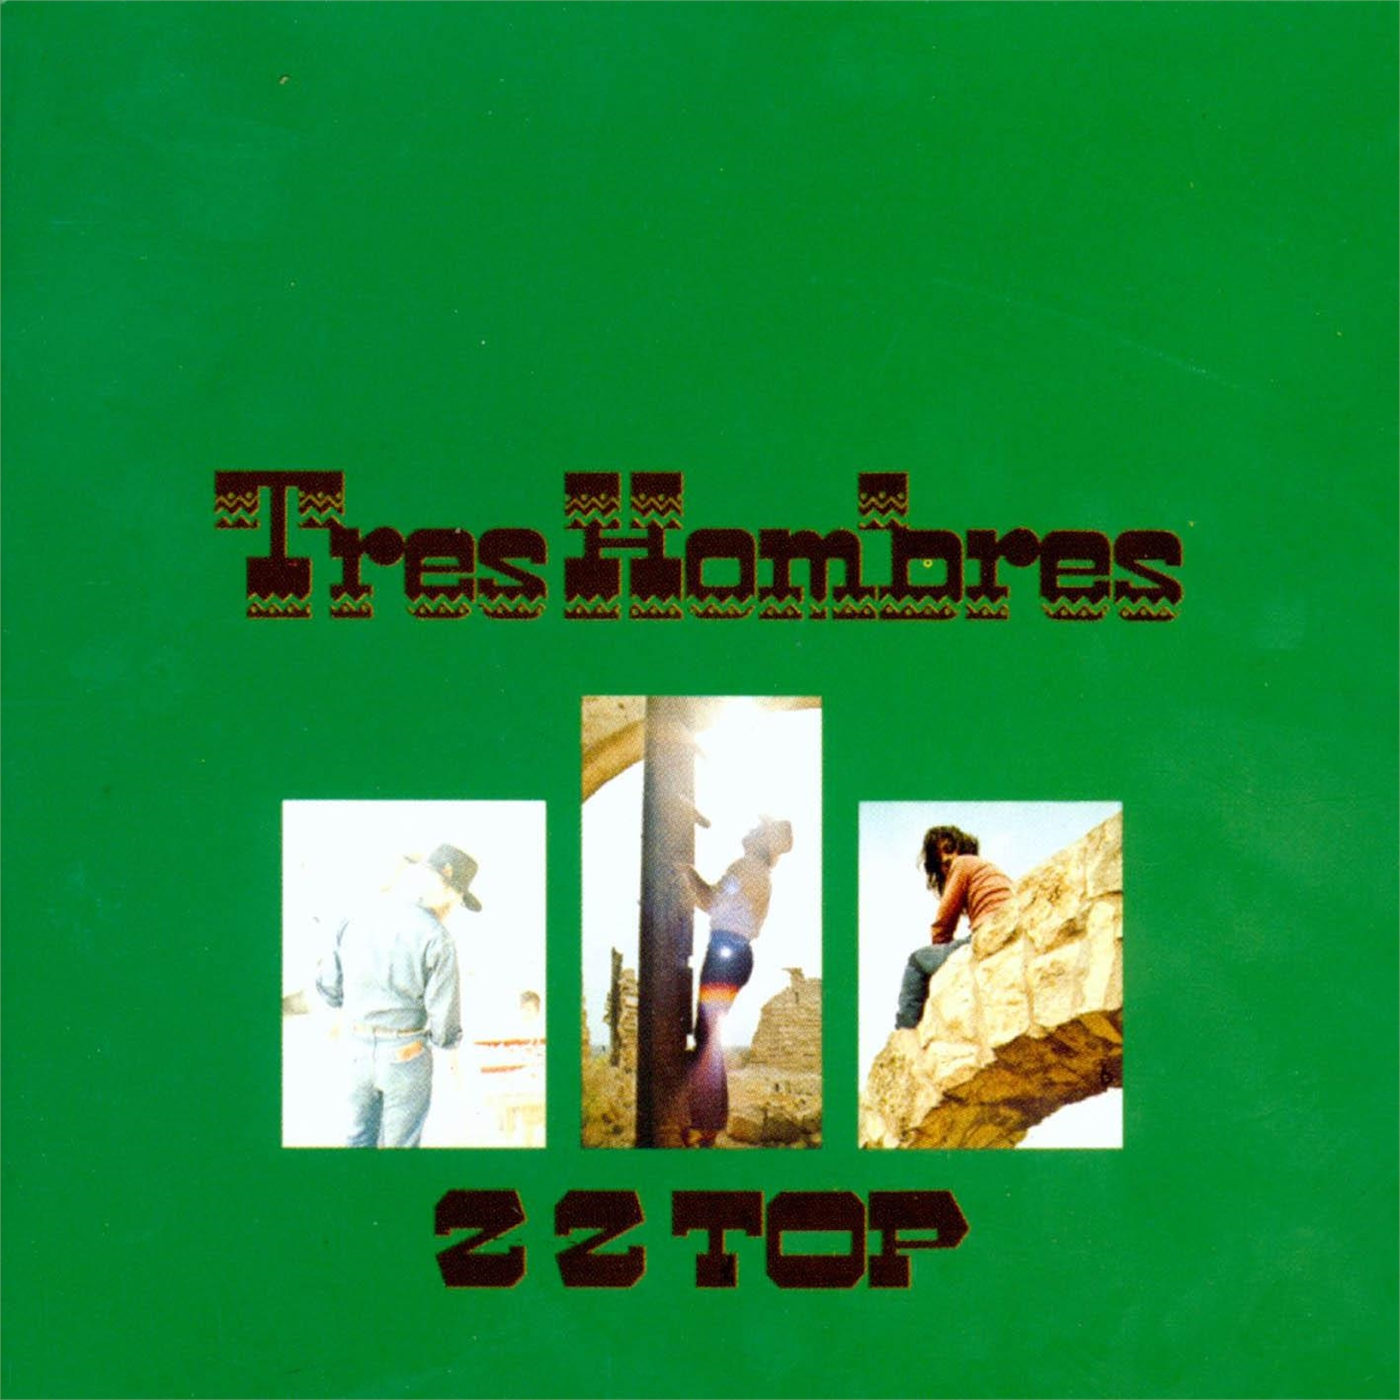 ZZ Top - Tres Hombres [LP]